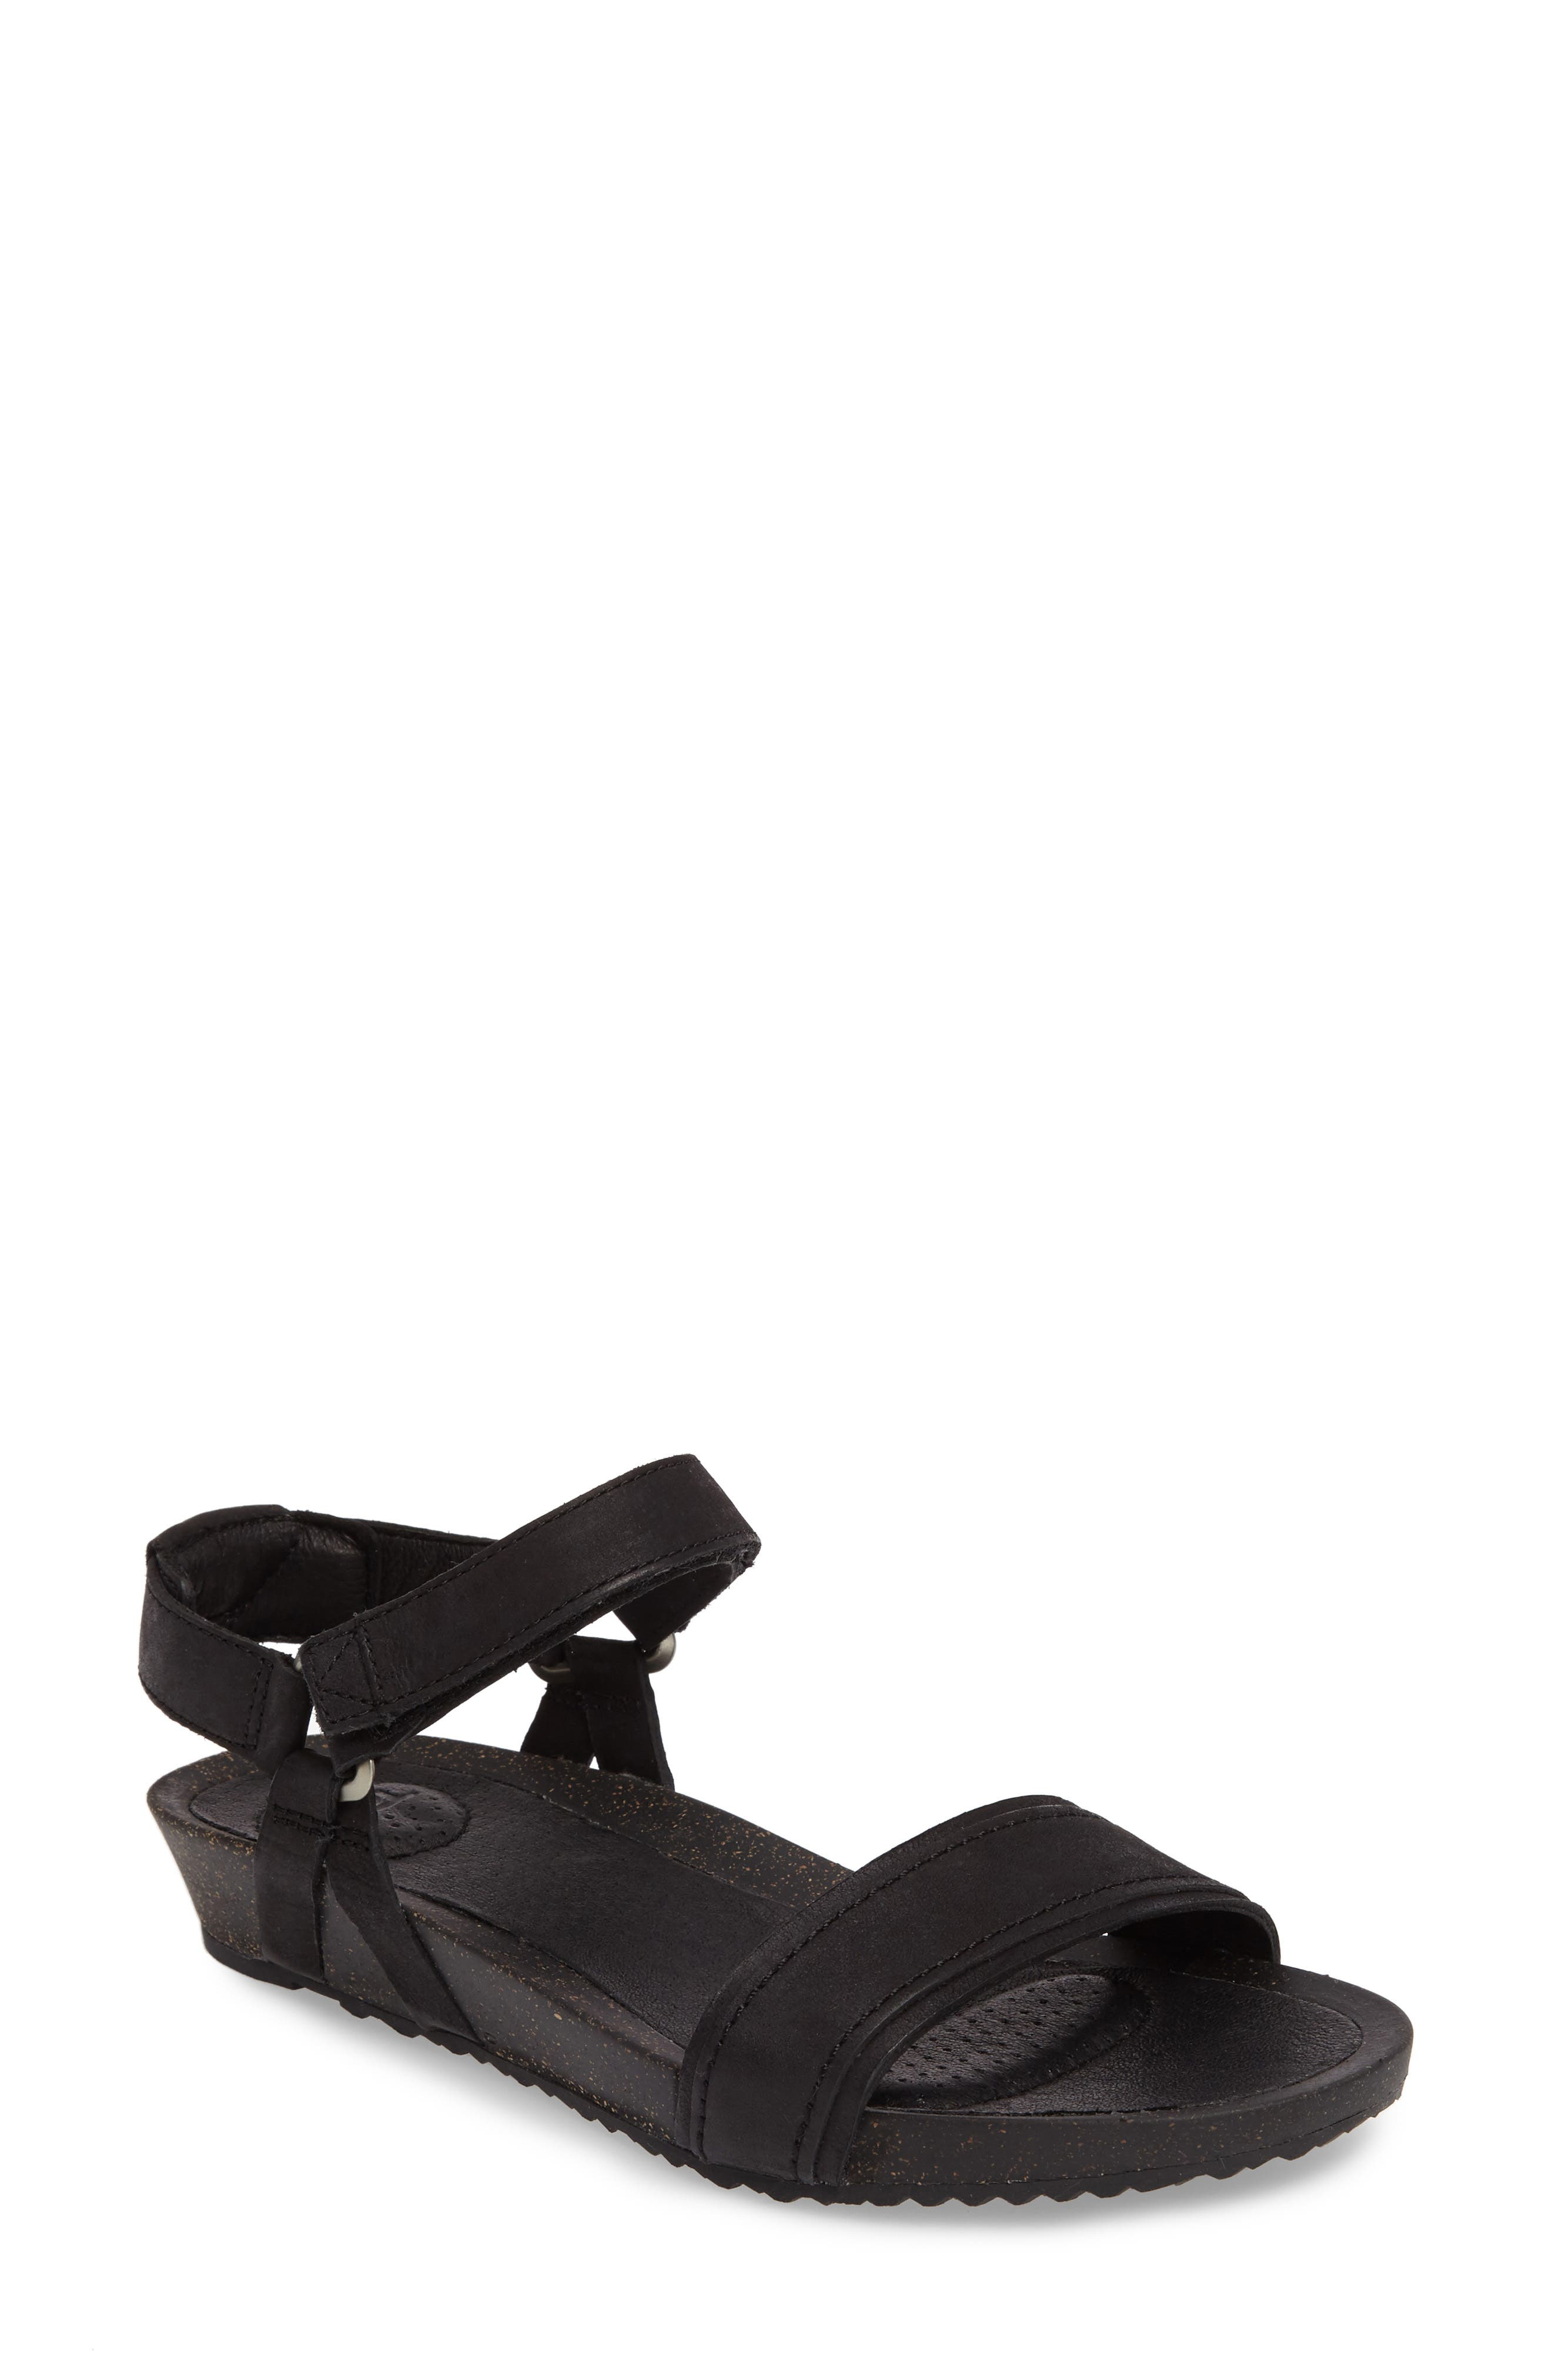 Main Image - Teva Ysidro Stitch Sandal (Women)